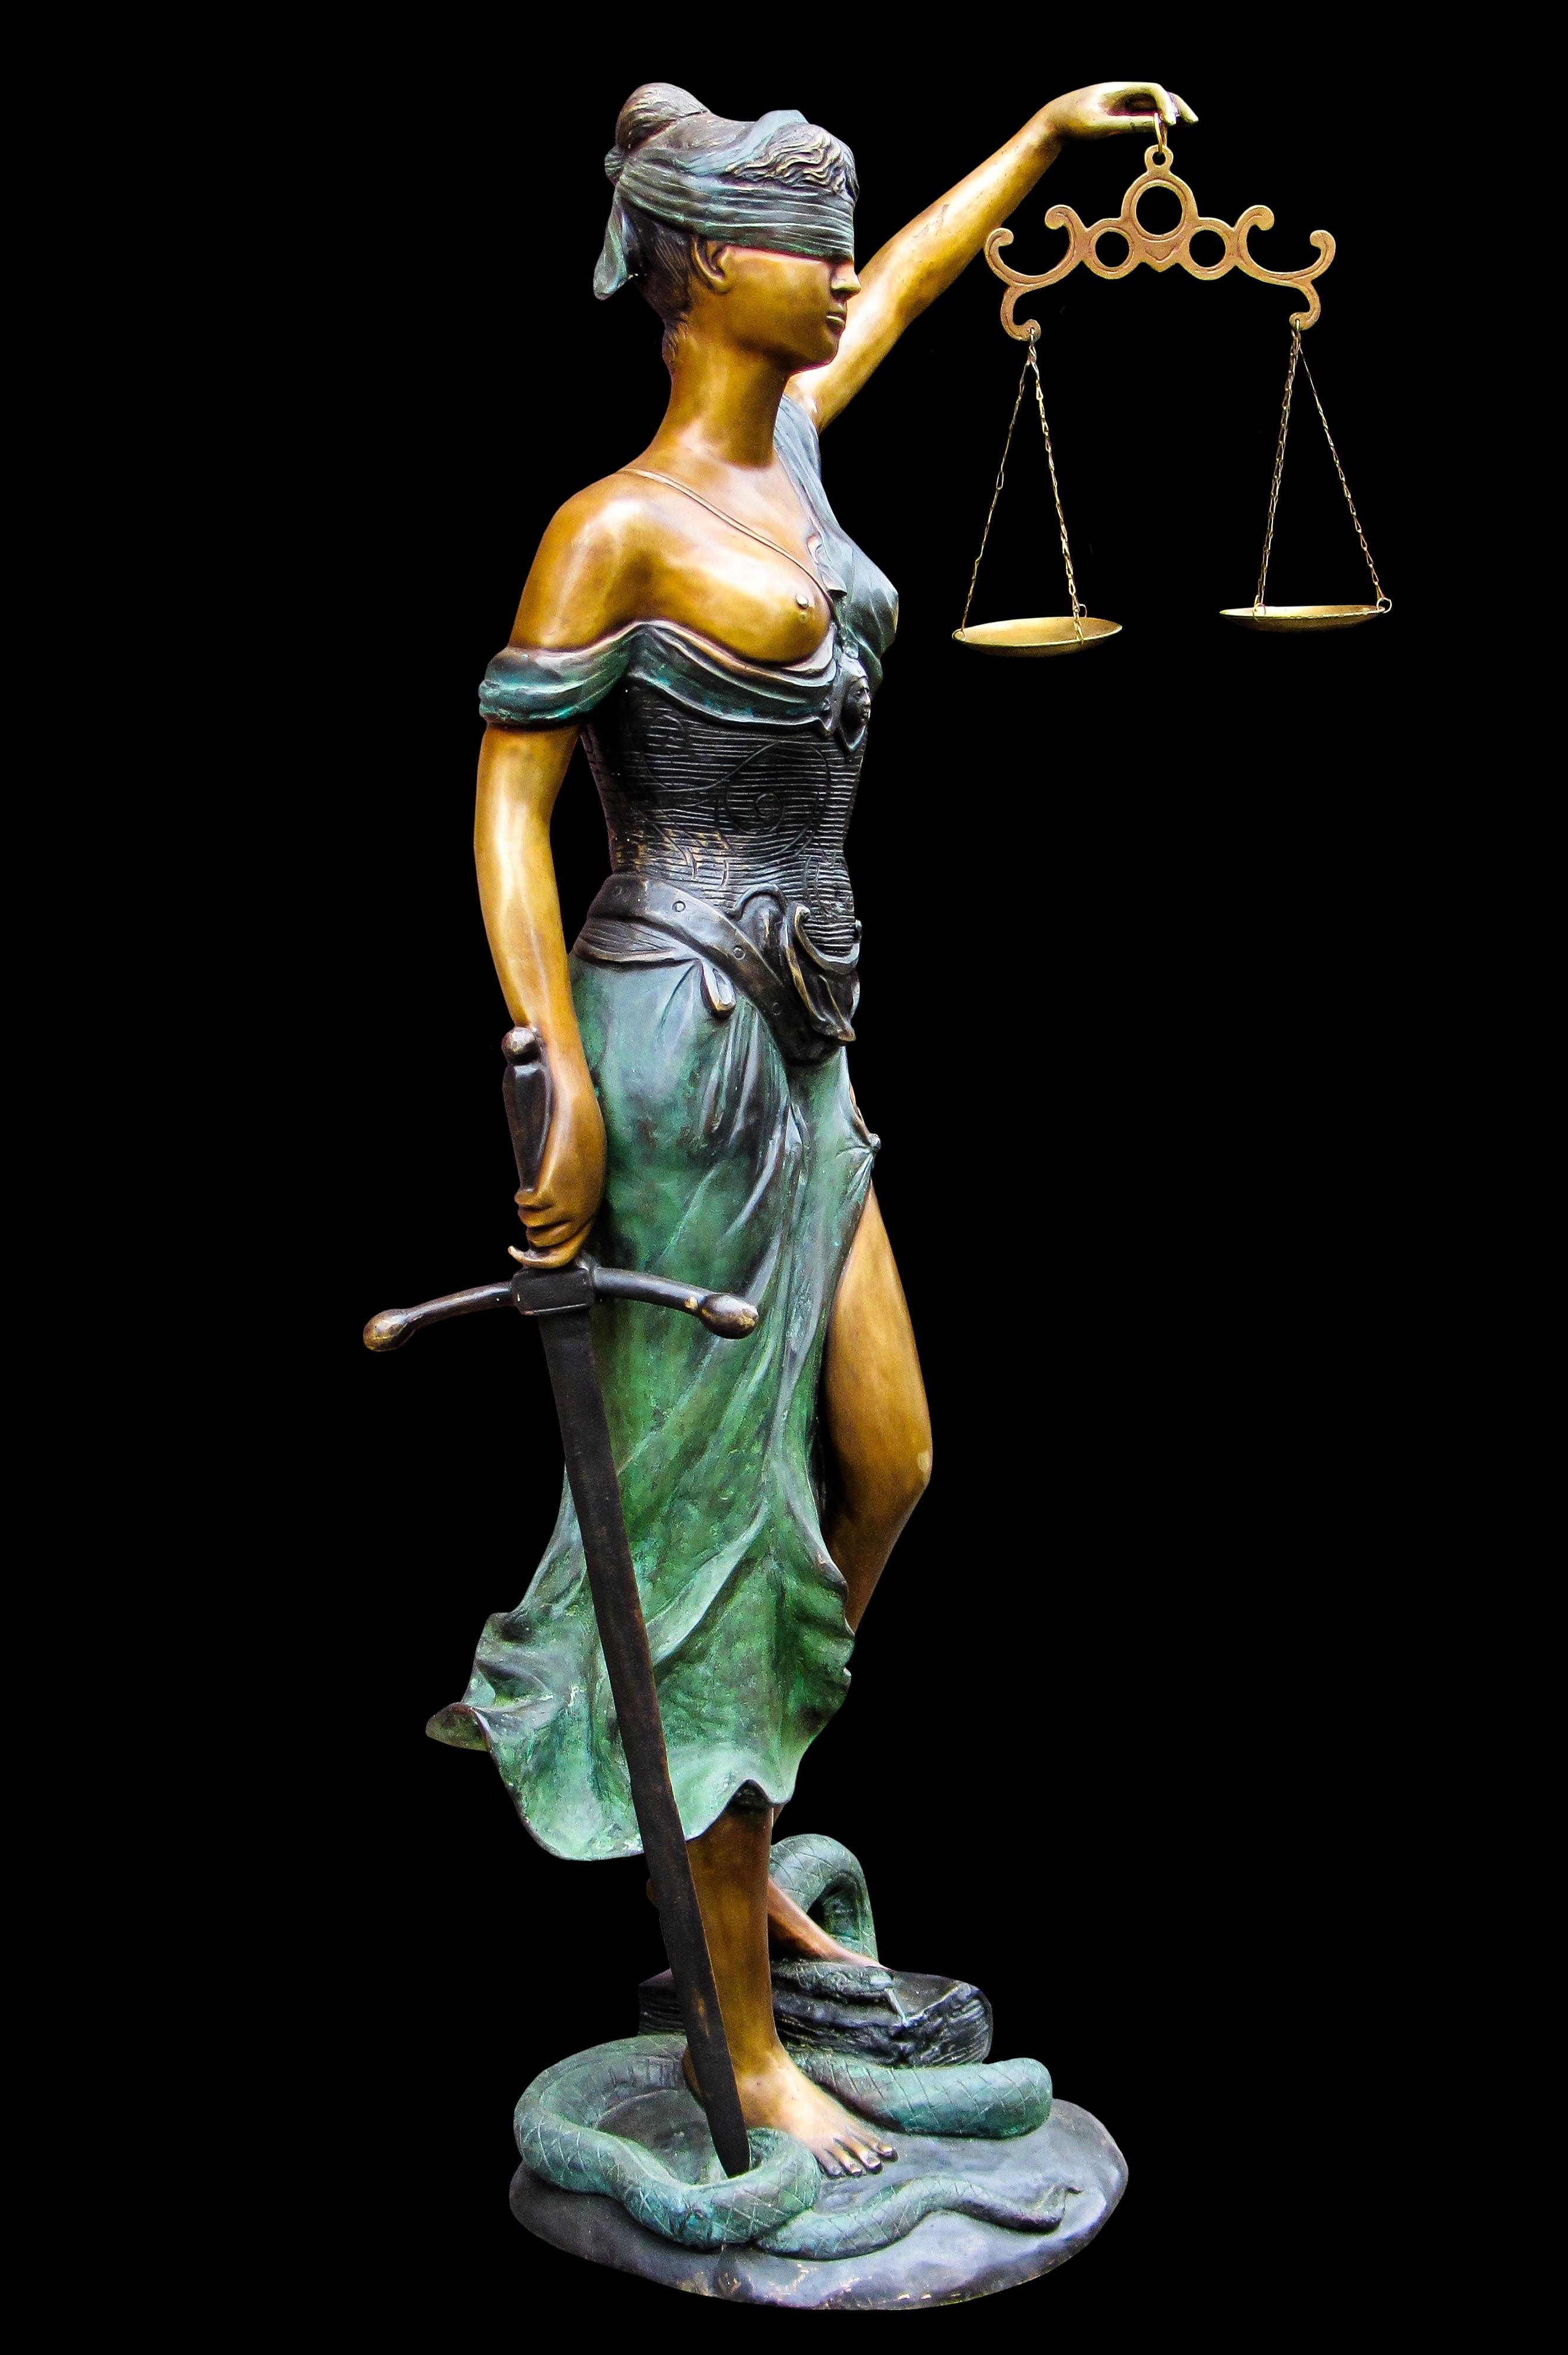 Prostitution/Solicitation – Penal Code 647(b) | Arthur